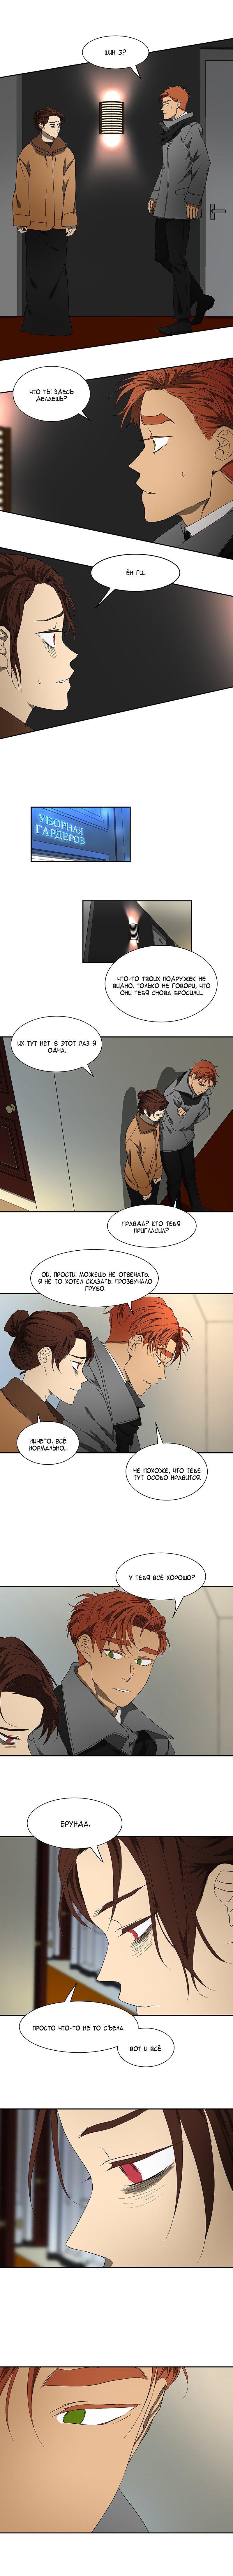 Манга Я люблю Ю / I love Yoo  - Том 1 Глава 49 Страница 3